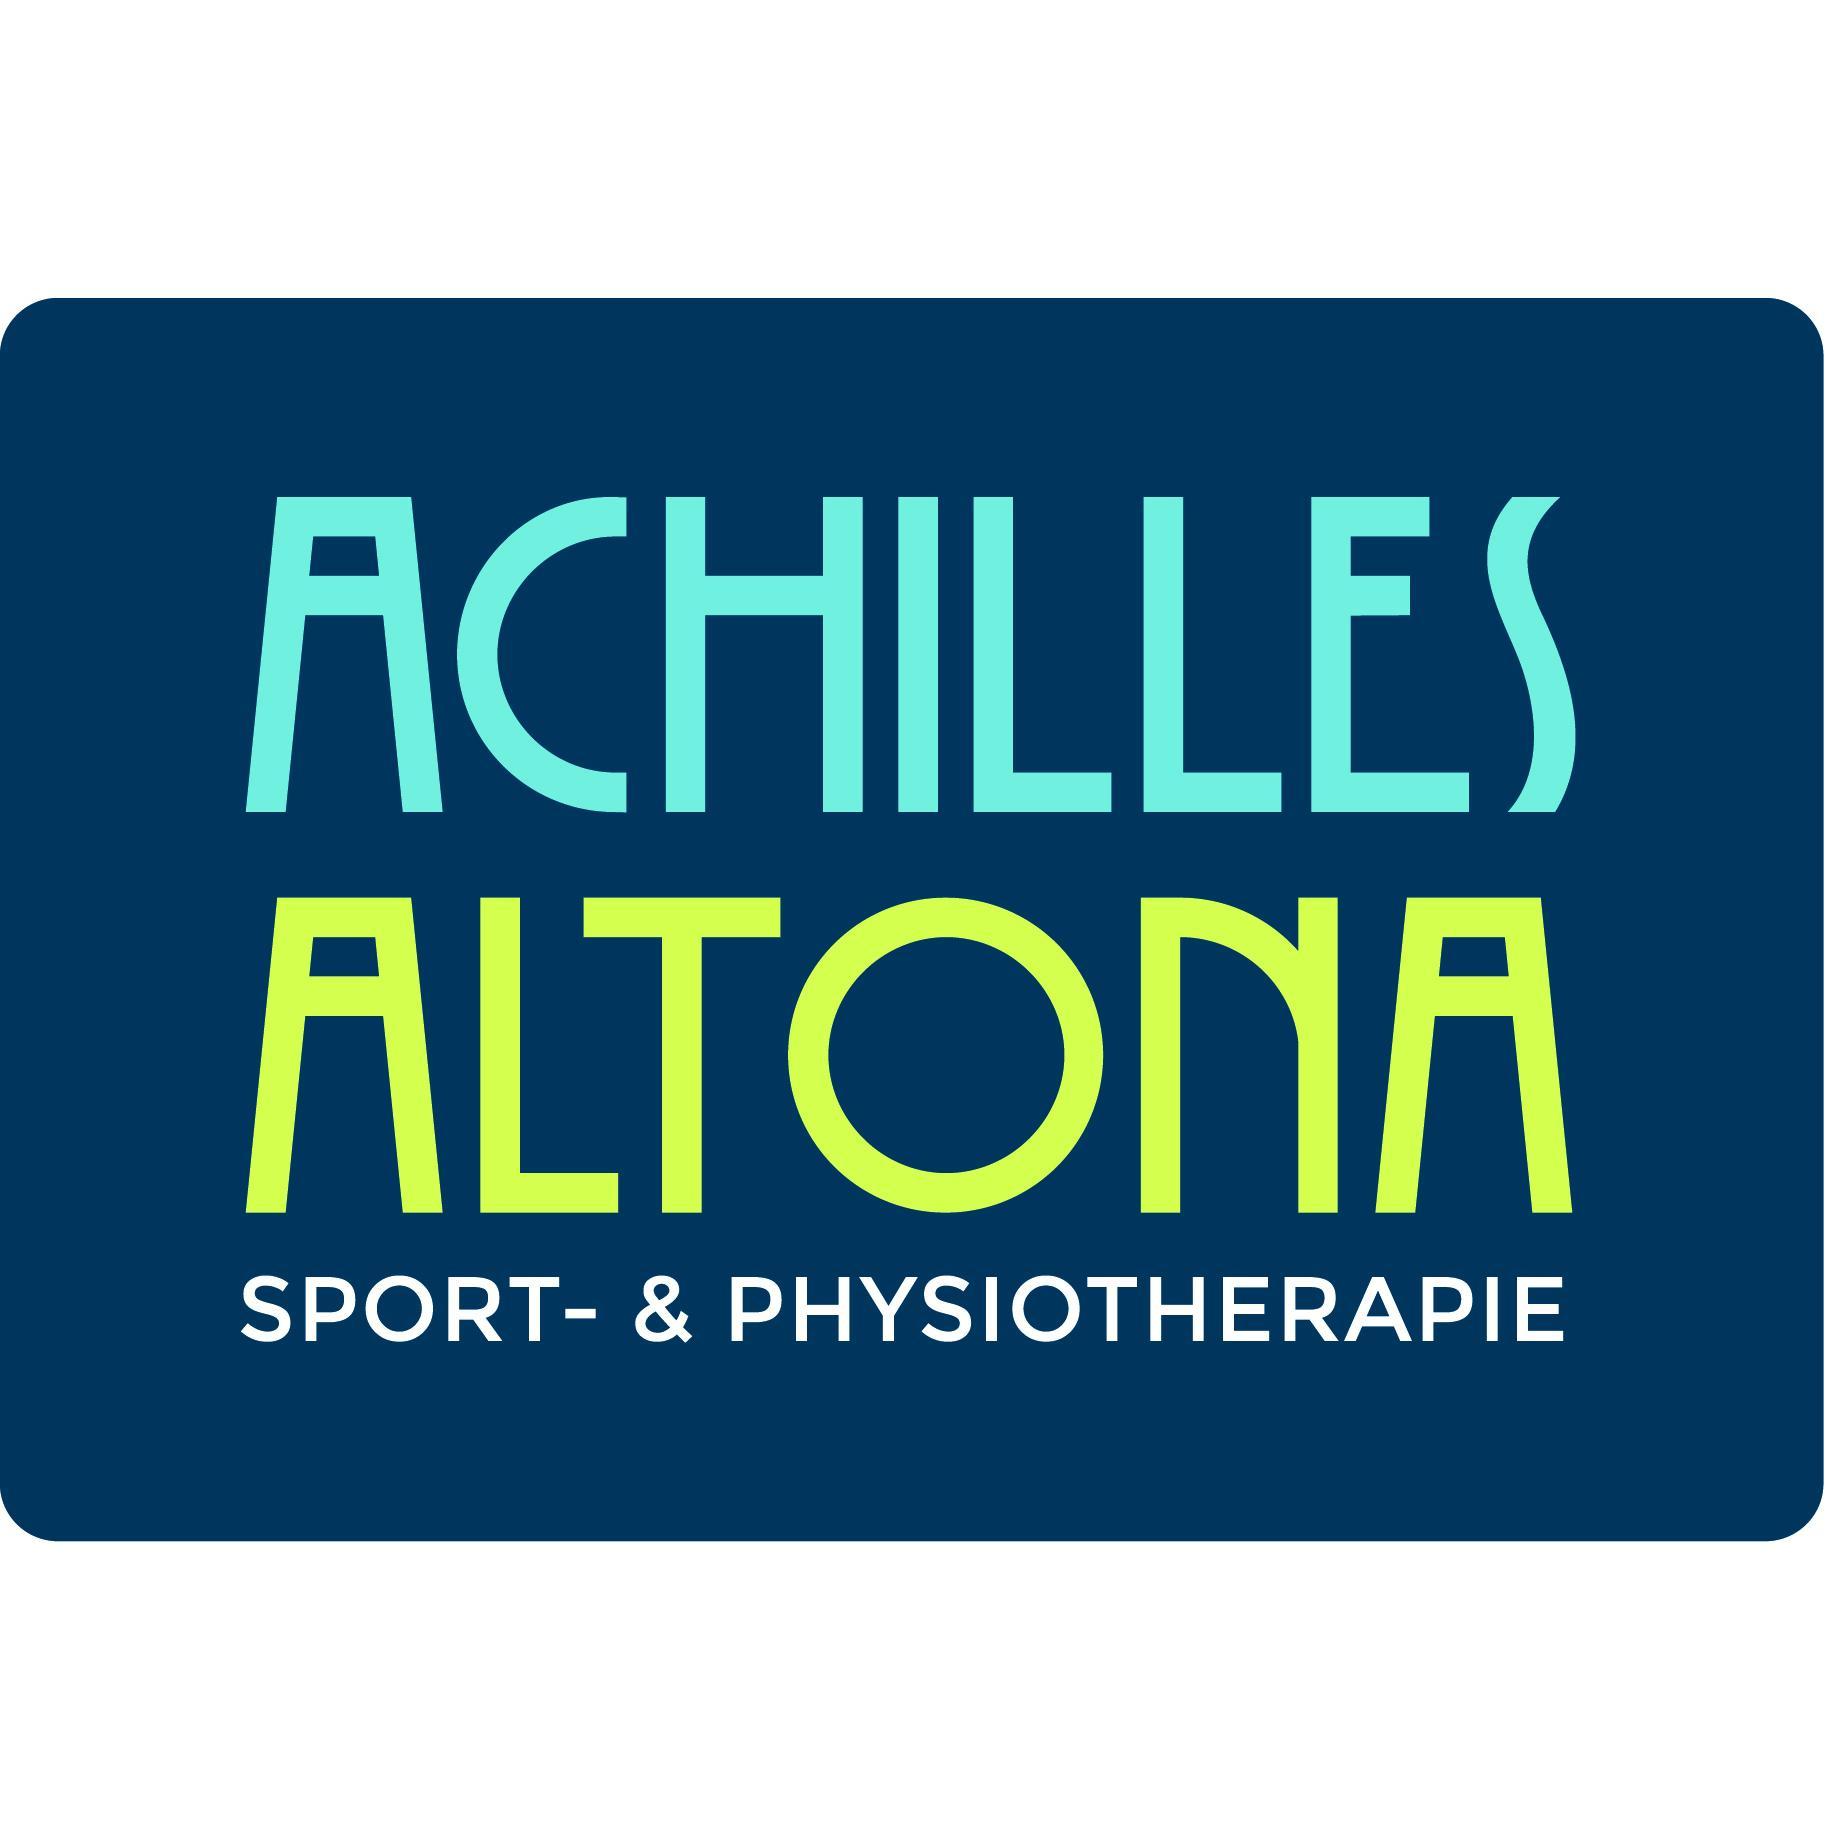 Achilles Altona Sport- und Physiotherapie